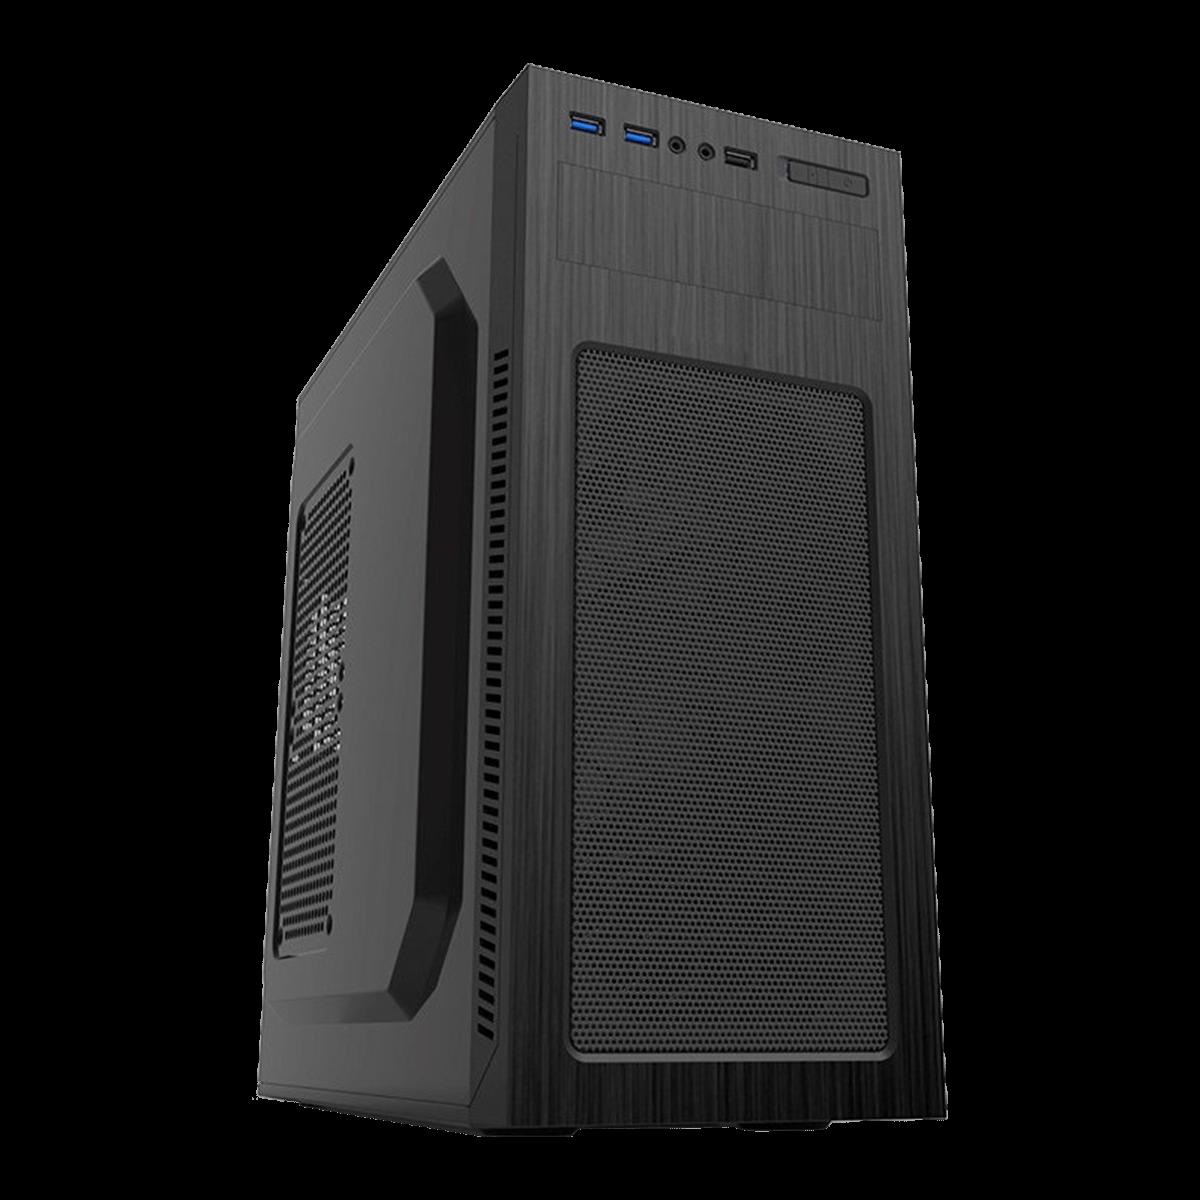 <span>PC</span> starter  a6 9500 4go ssd 120go